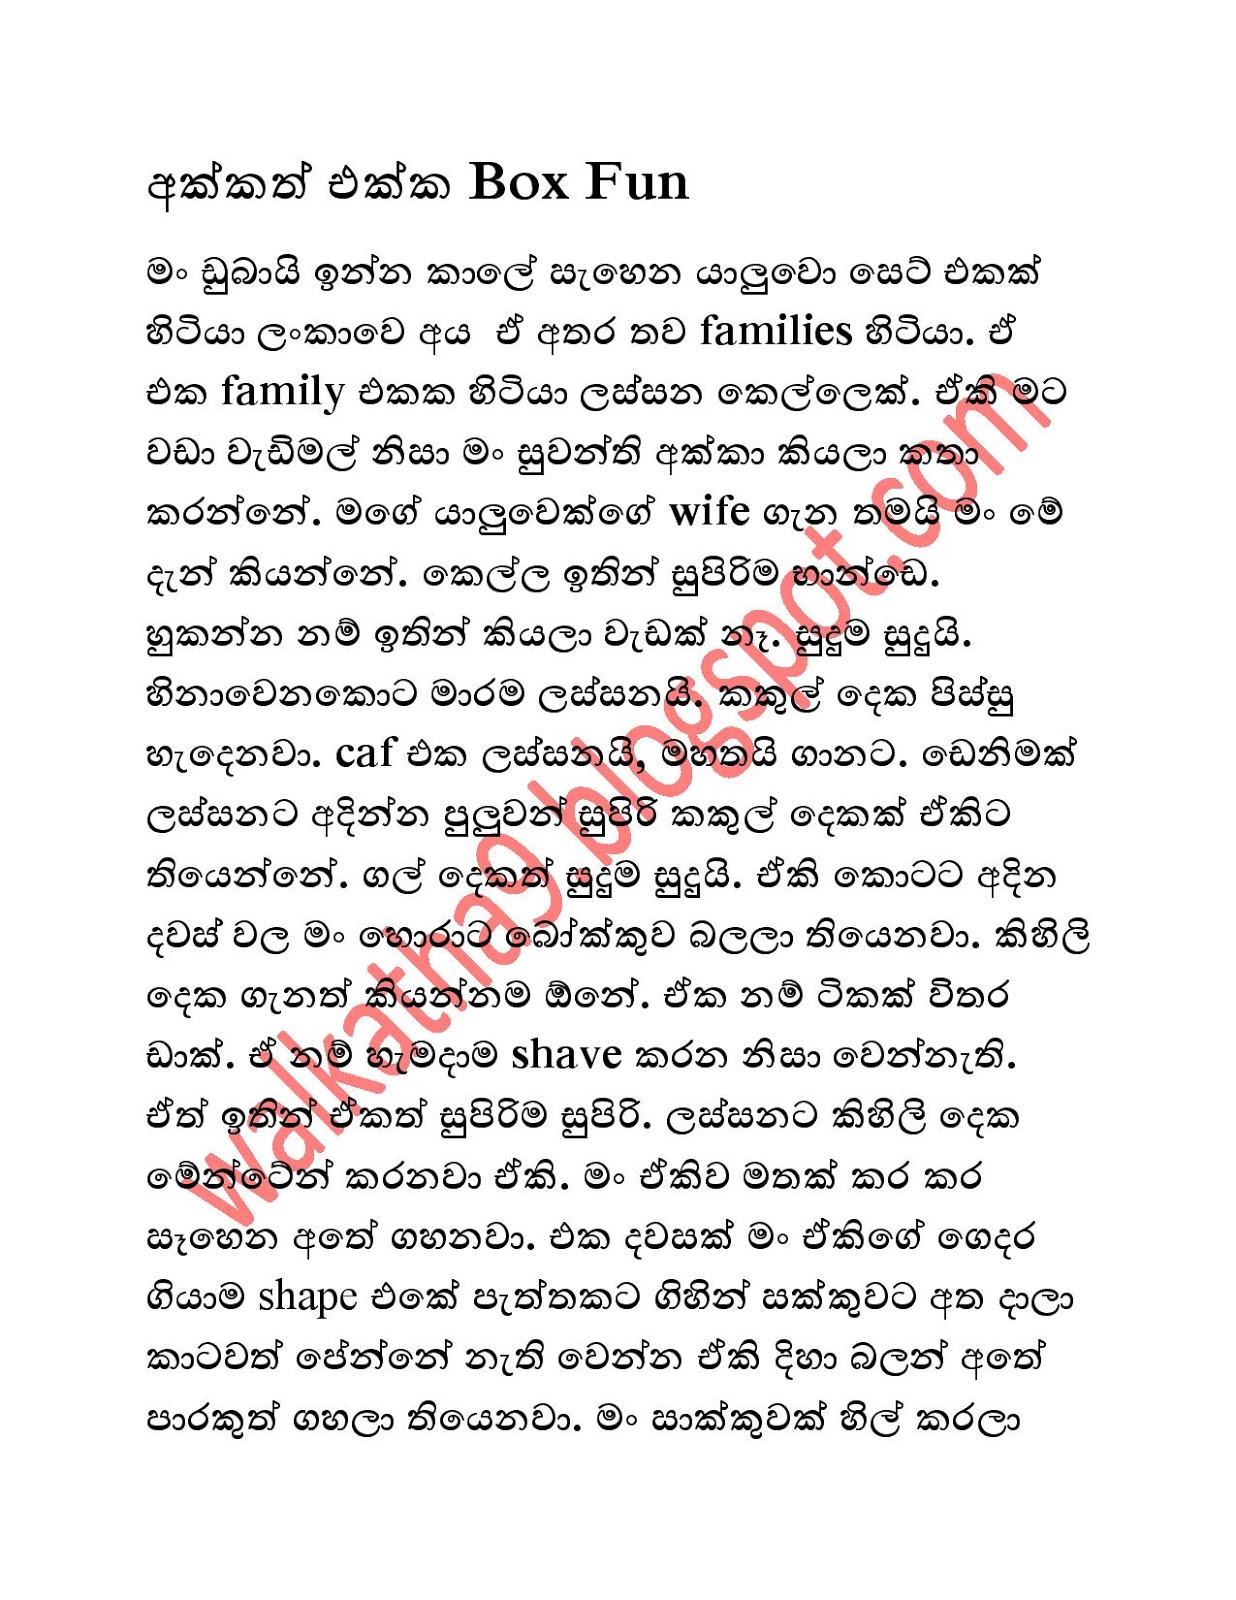 Akka Ekka Box Funcfty - Sinhala Wal Katha